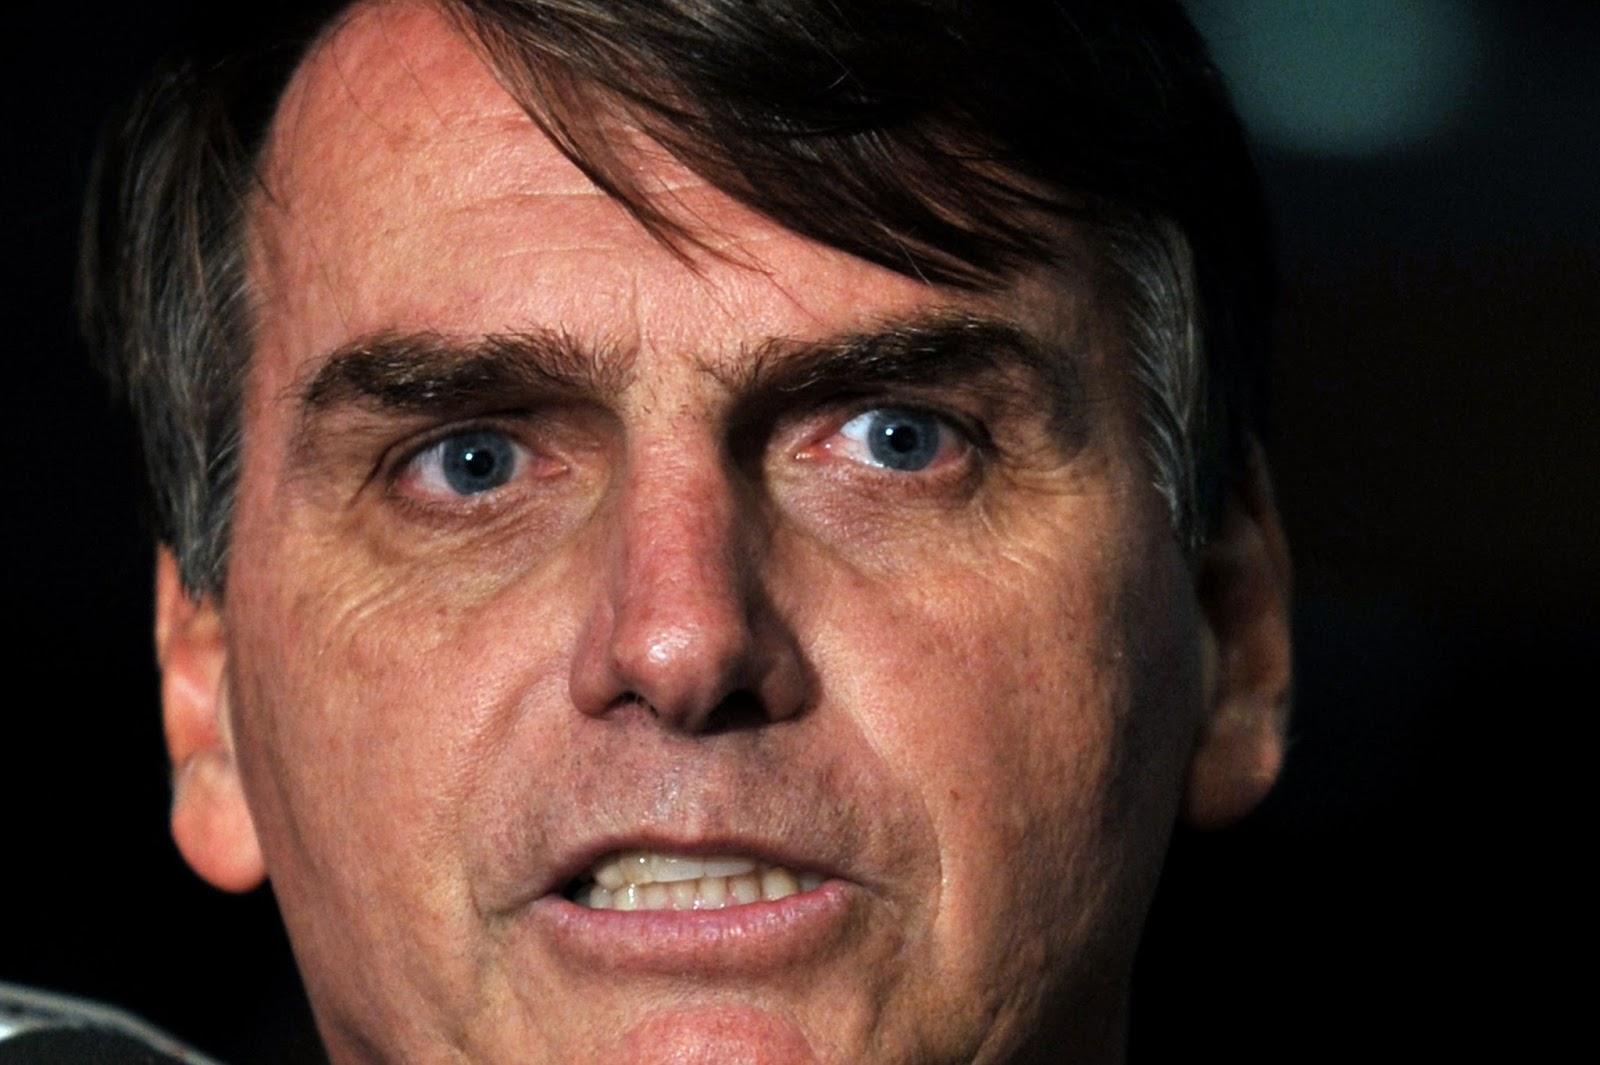 Justiça condena Bolsonaro a pagar R$ 150 mil a fundo de defesa LGBT por homofobia